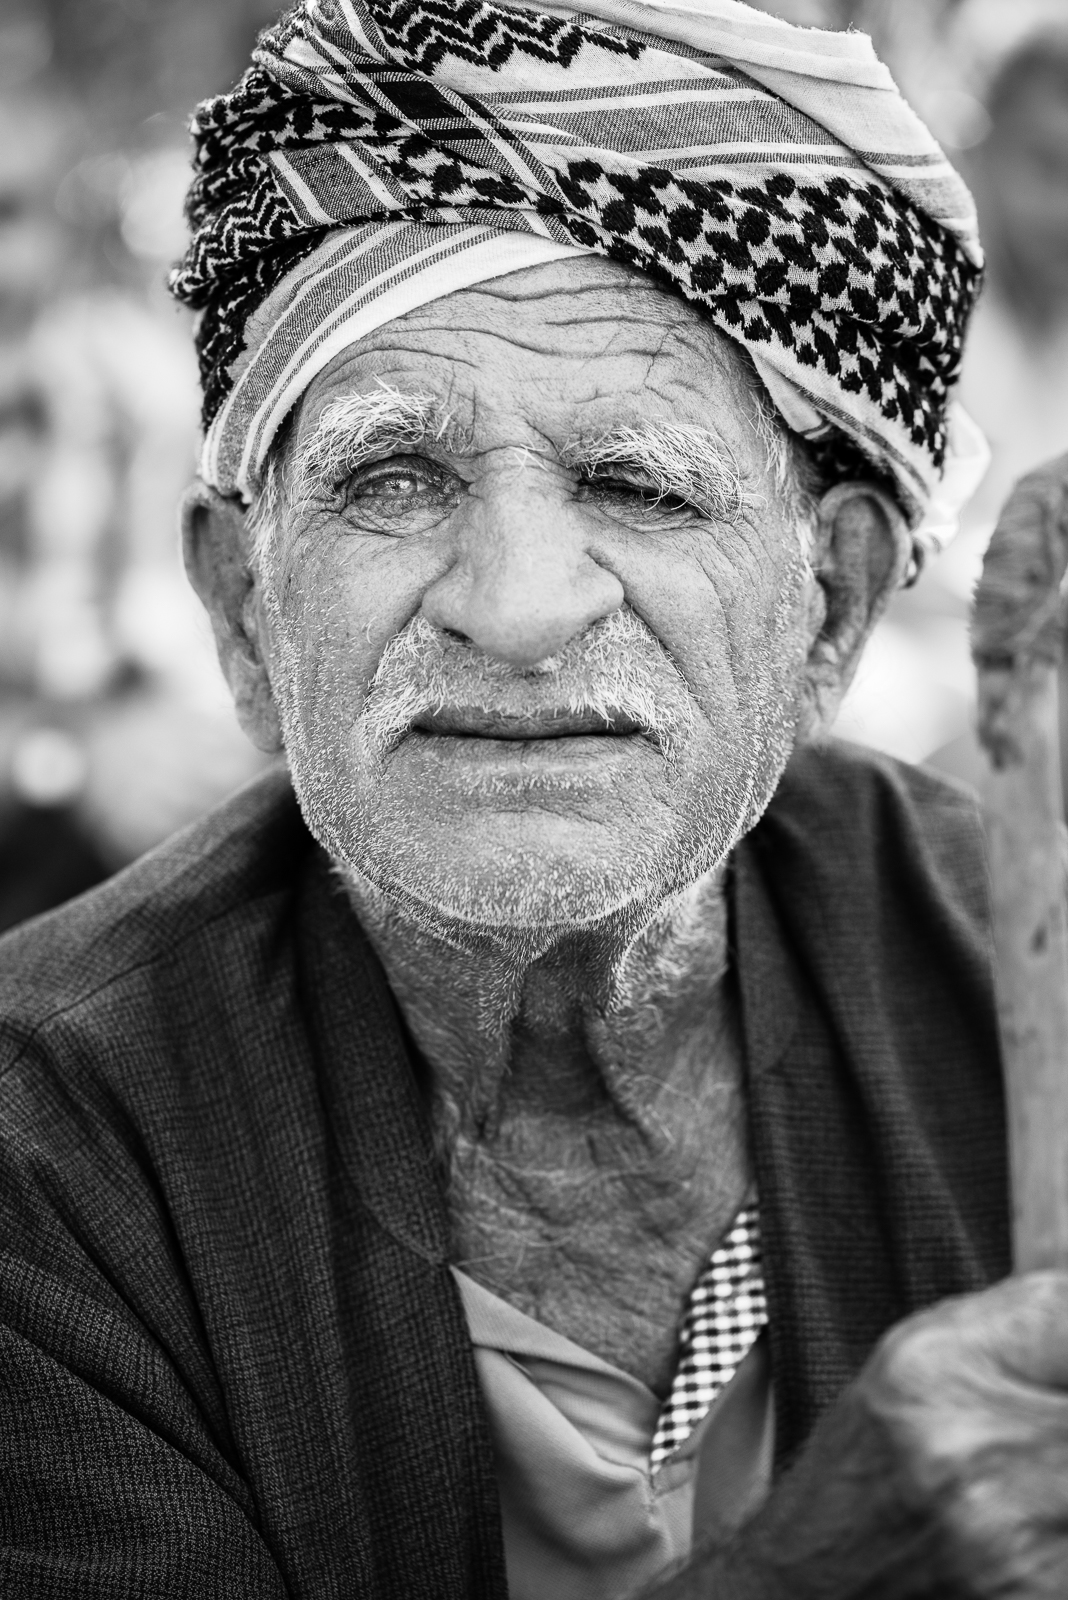 Elder man on the Erbil's streets